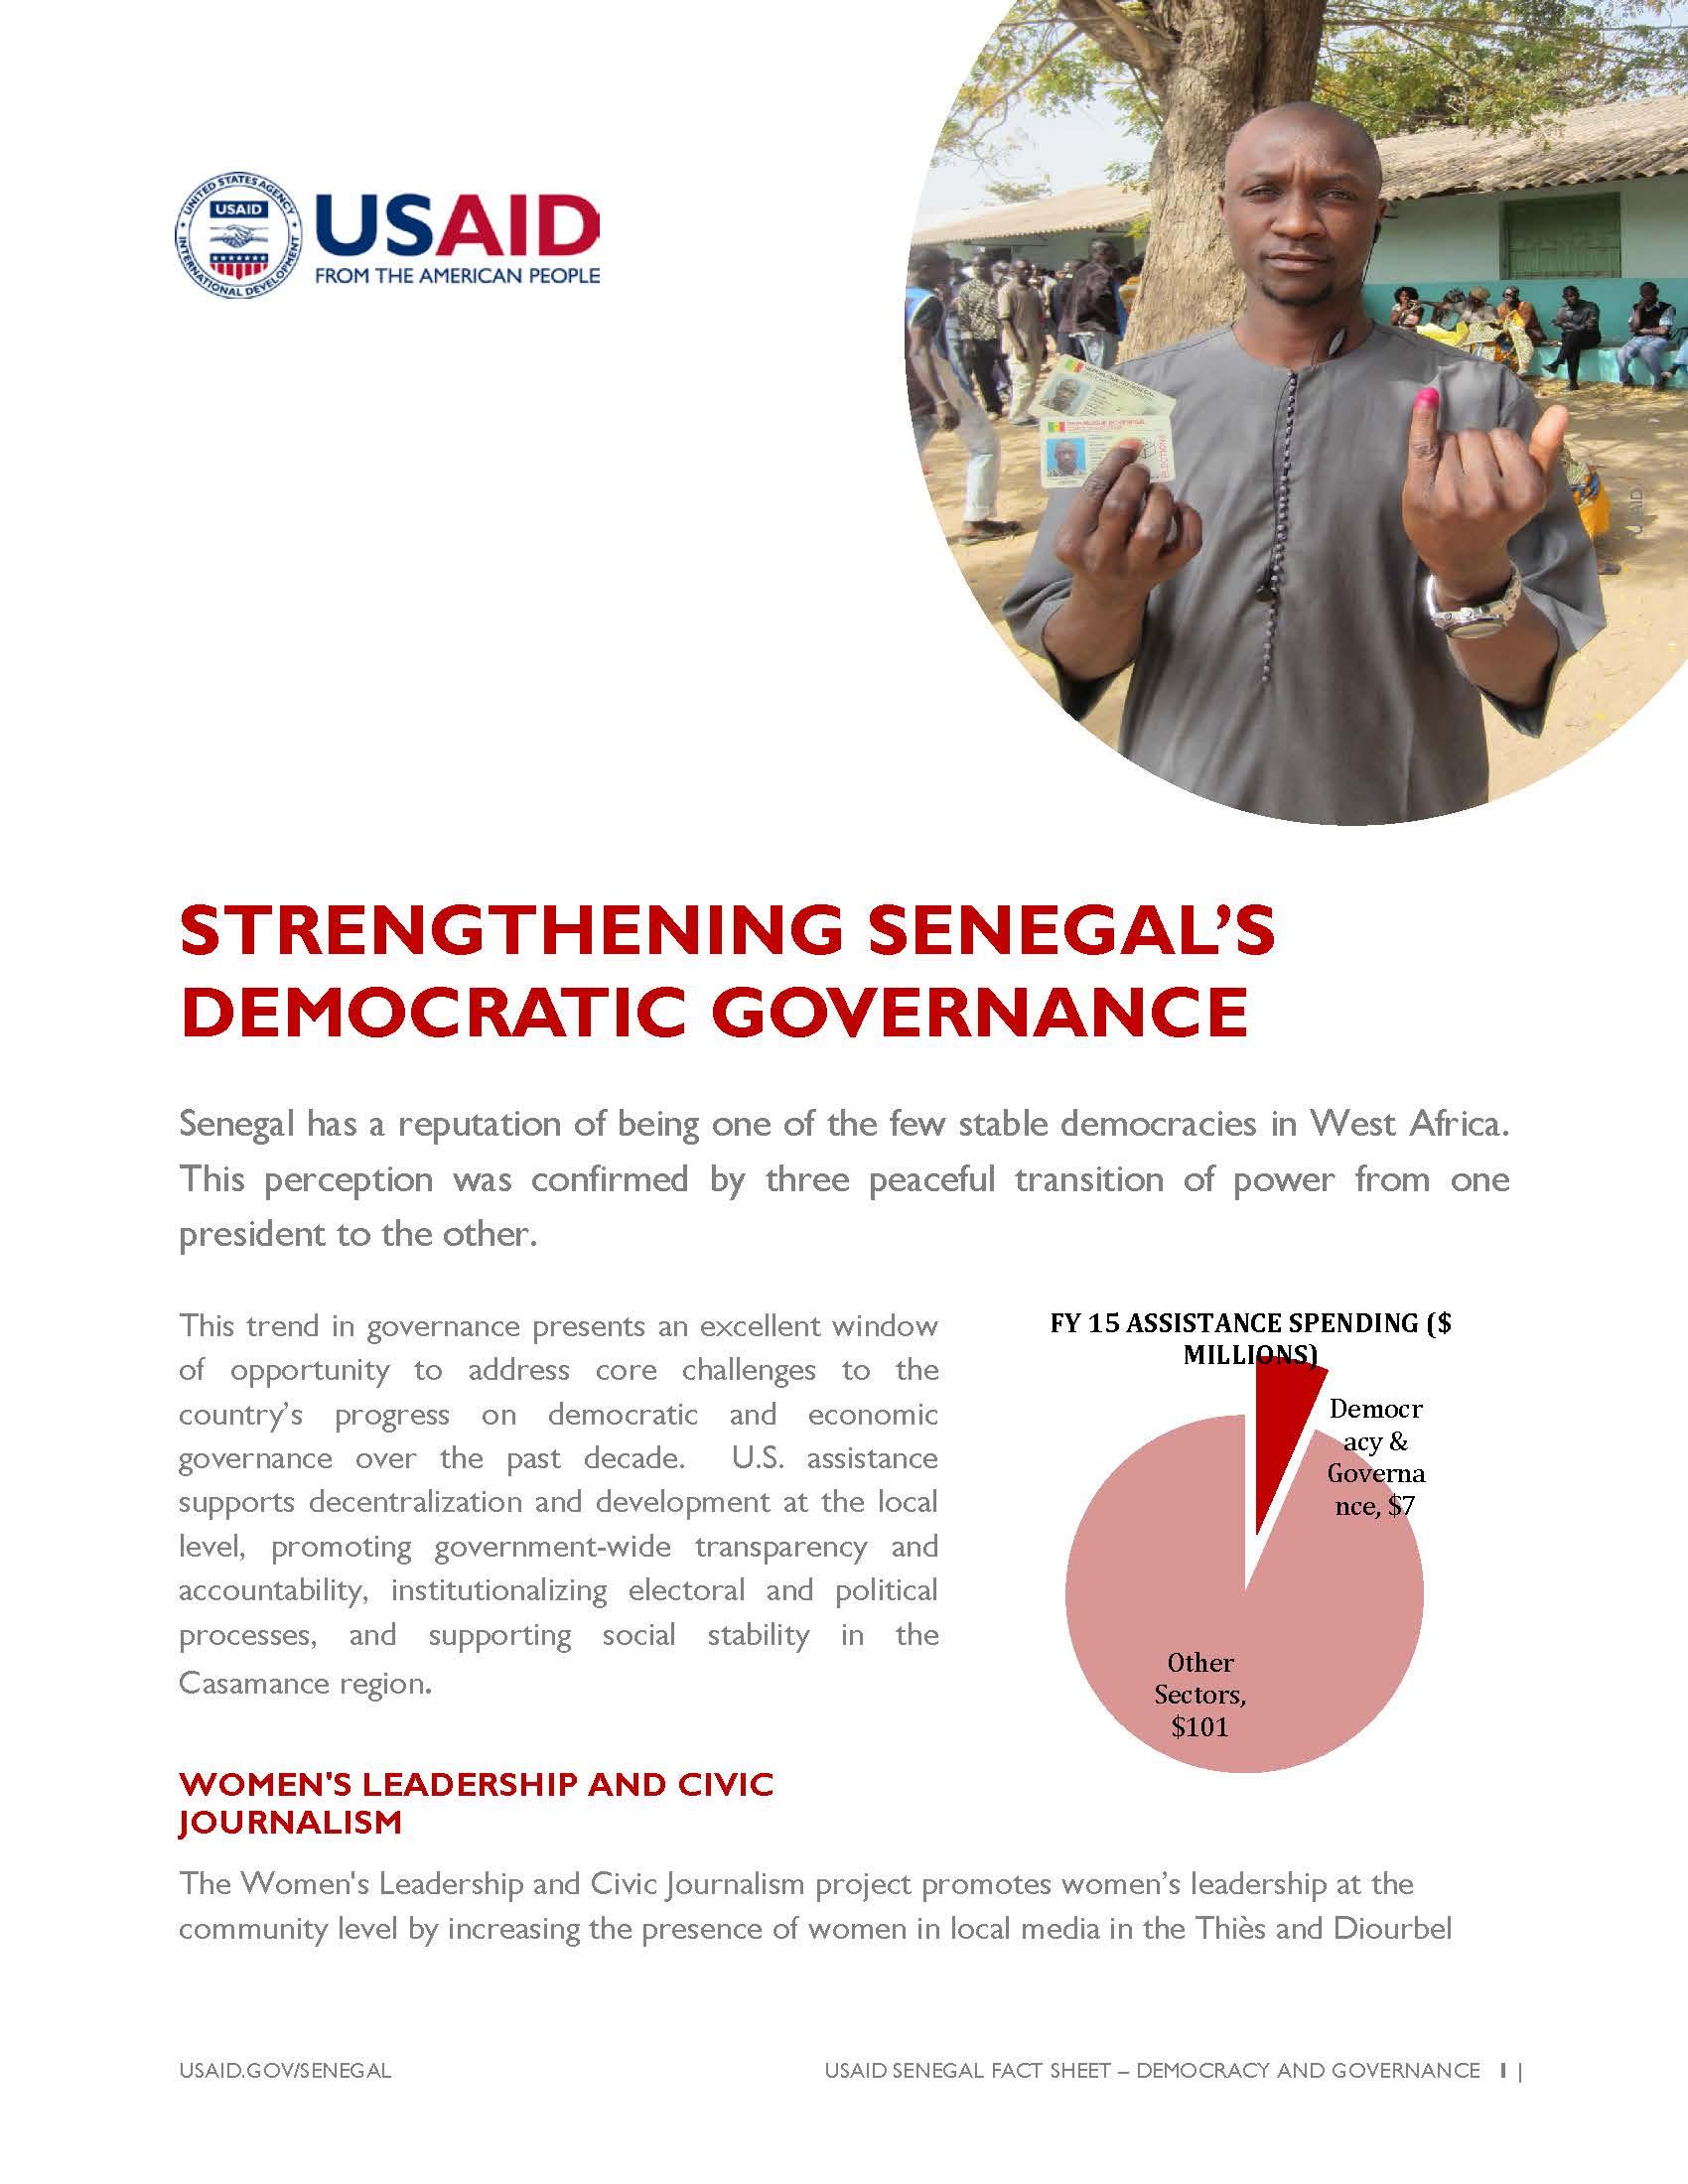 Strengthening Democratic Governance in Senegal